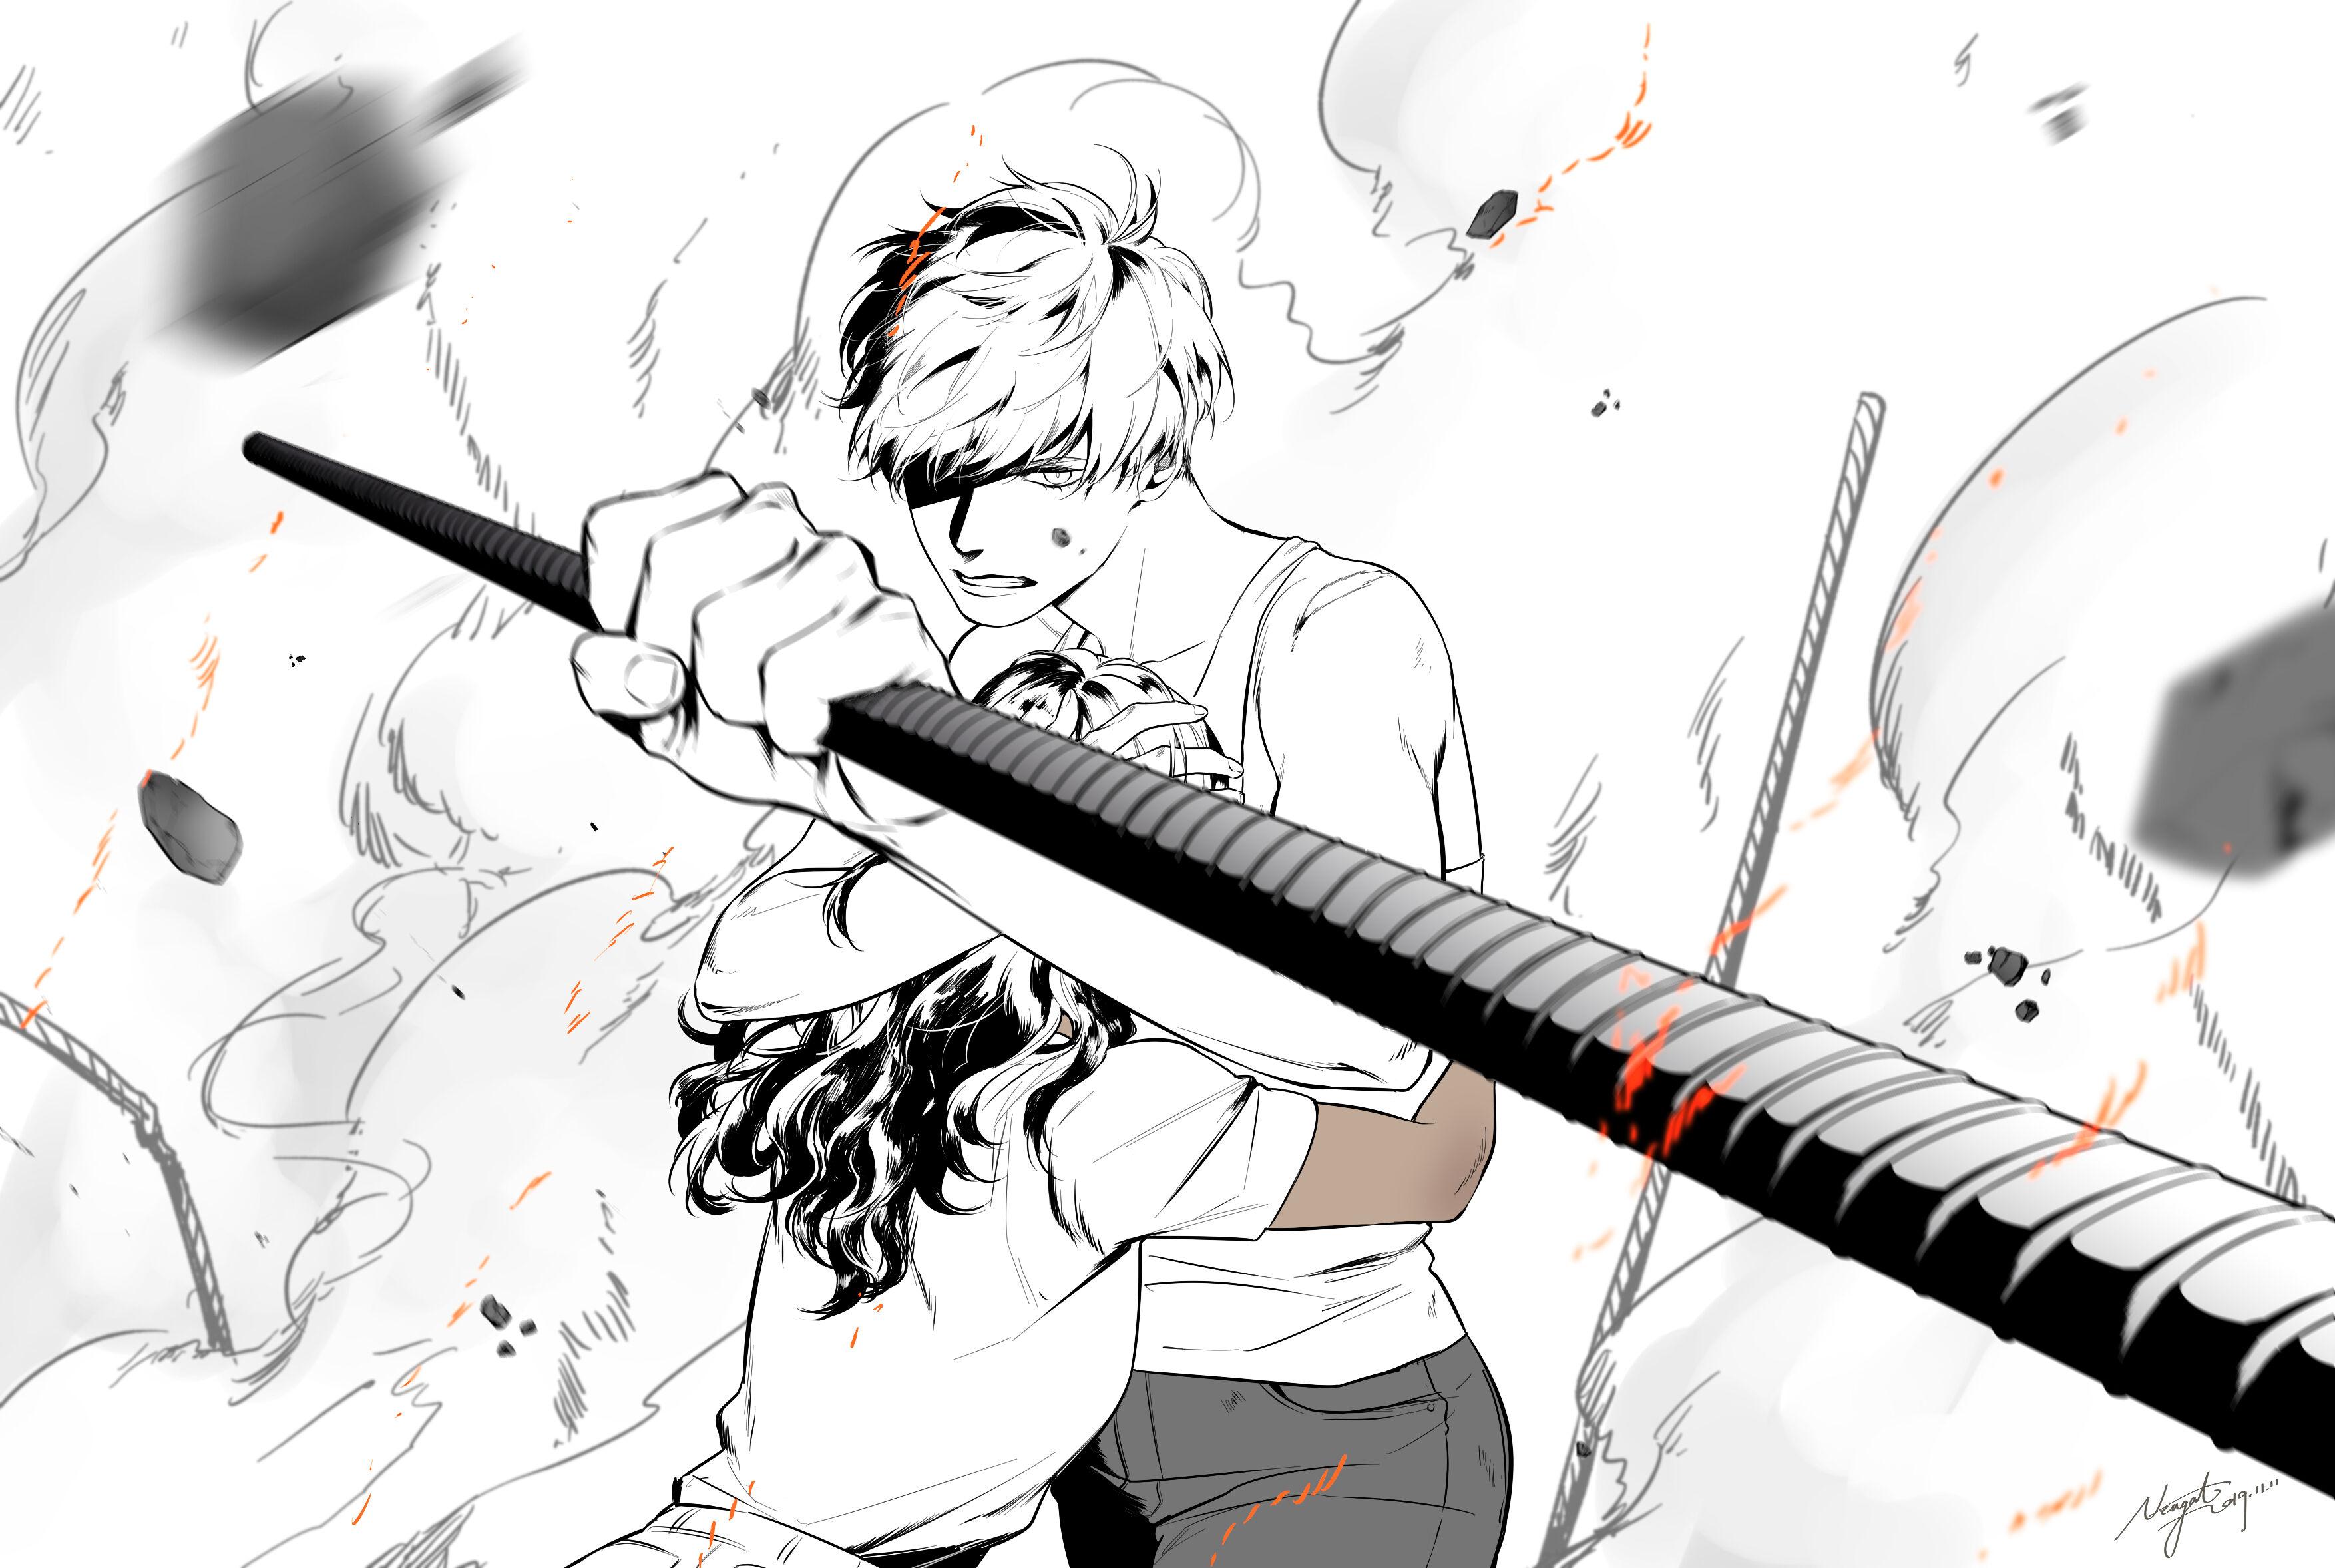 Neiigal 【塗/魔鬼終結者:黑暗宿命】#Terminator #MackenziePocky日沒畫pocky。但畫了鋼筋殼以嗎 - #nkdec3 - Plurk